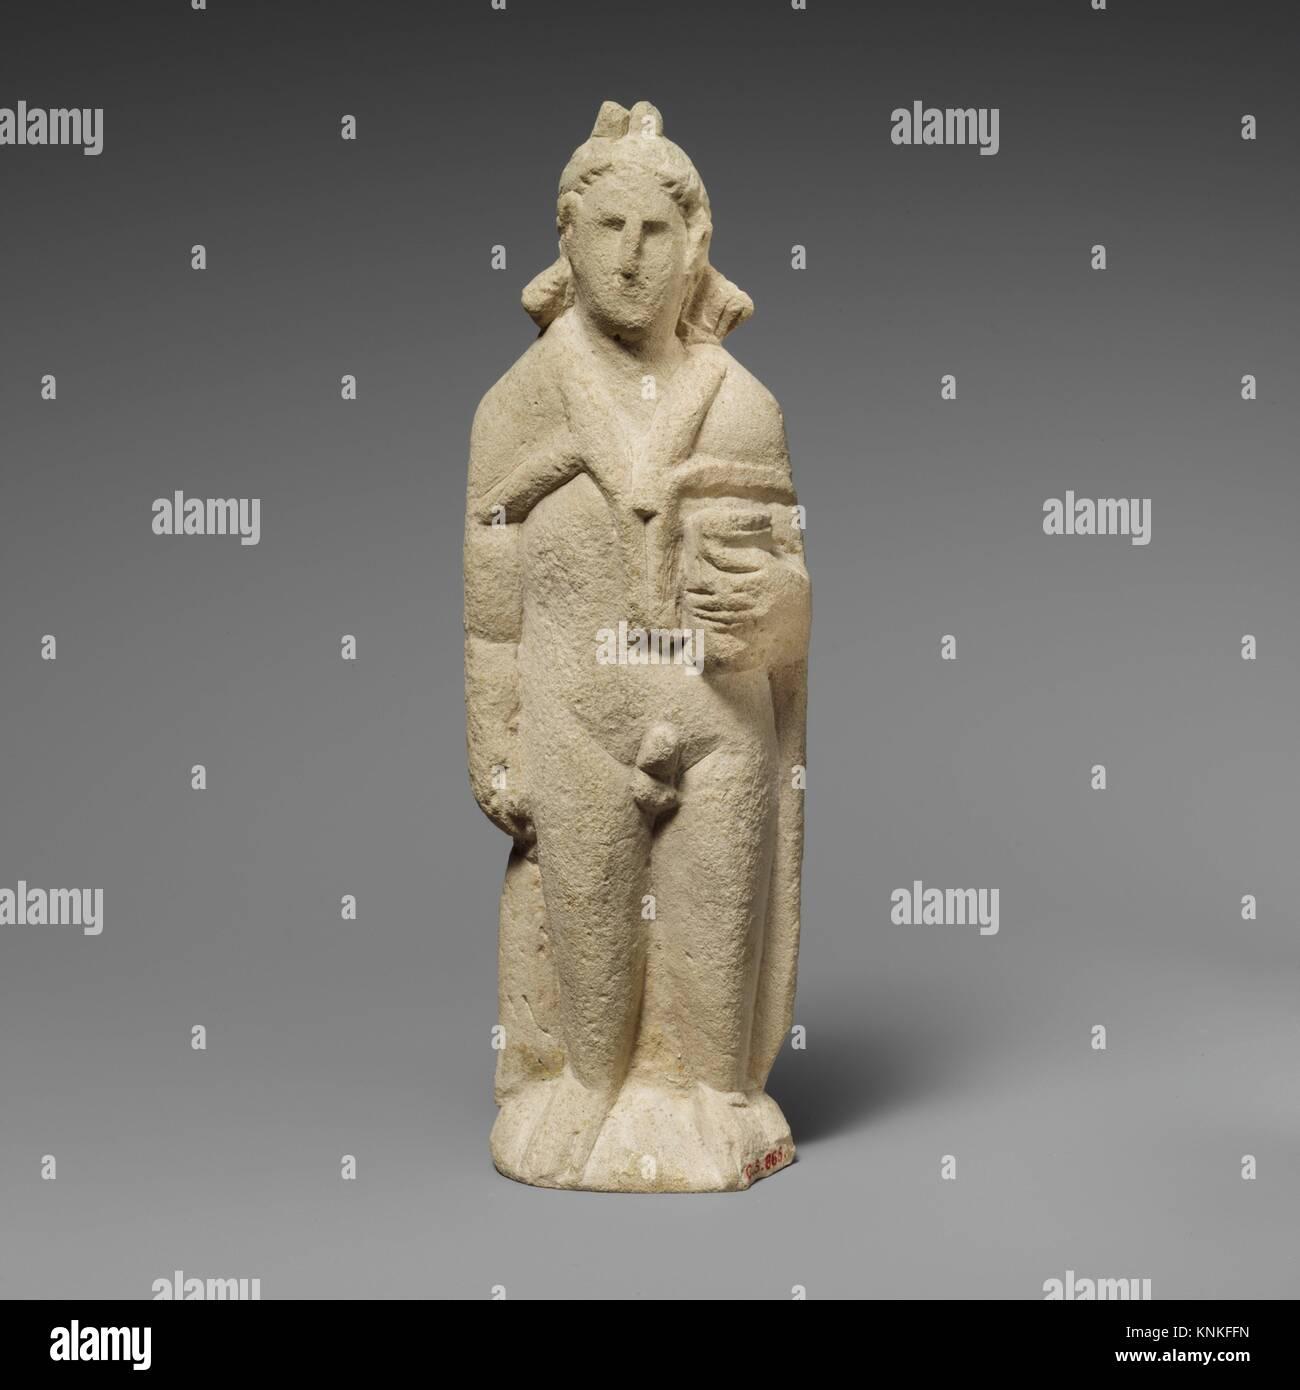 Limestone statuette of Pan. Period: Hellenistic; Date: 310-30 B.C; Culture: Cypriot; Medium: Limestone; Dimensions: Stock Photo